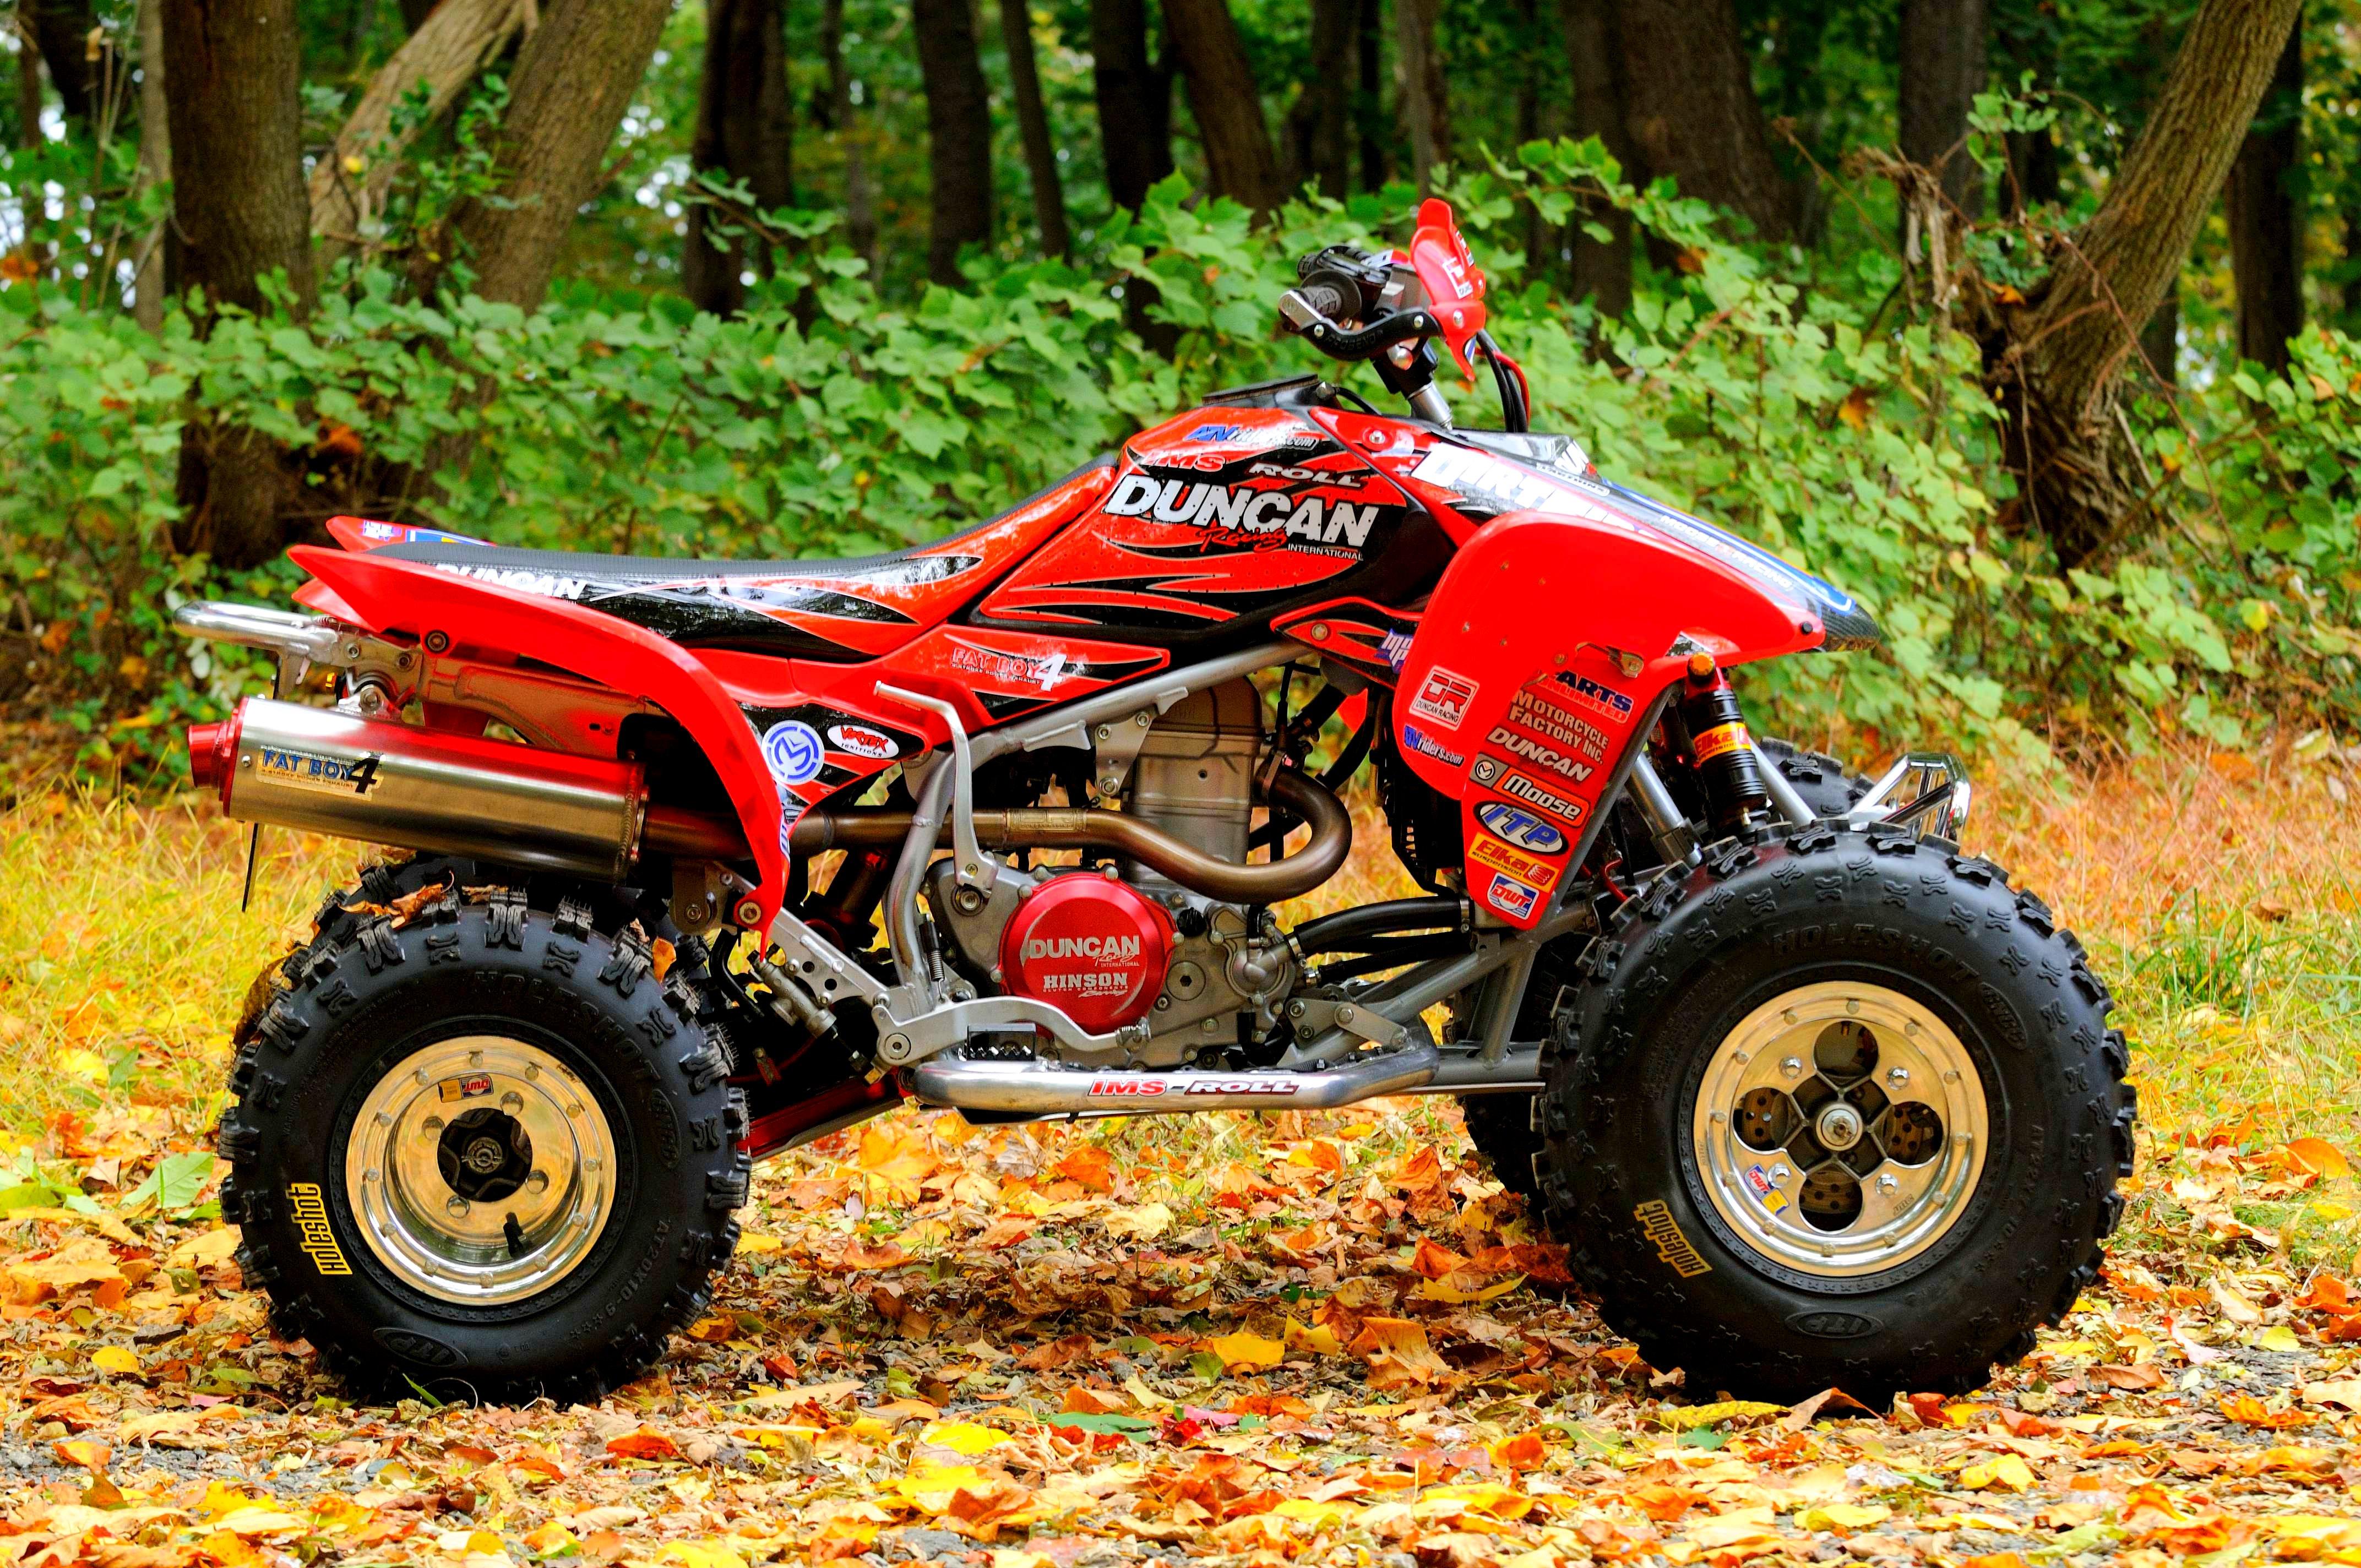 Honda Atv Tires QUADS | ANDY'S WORLD of MOTO